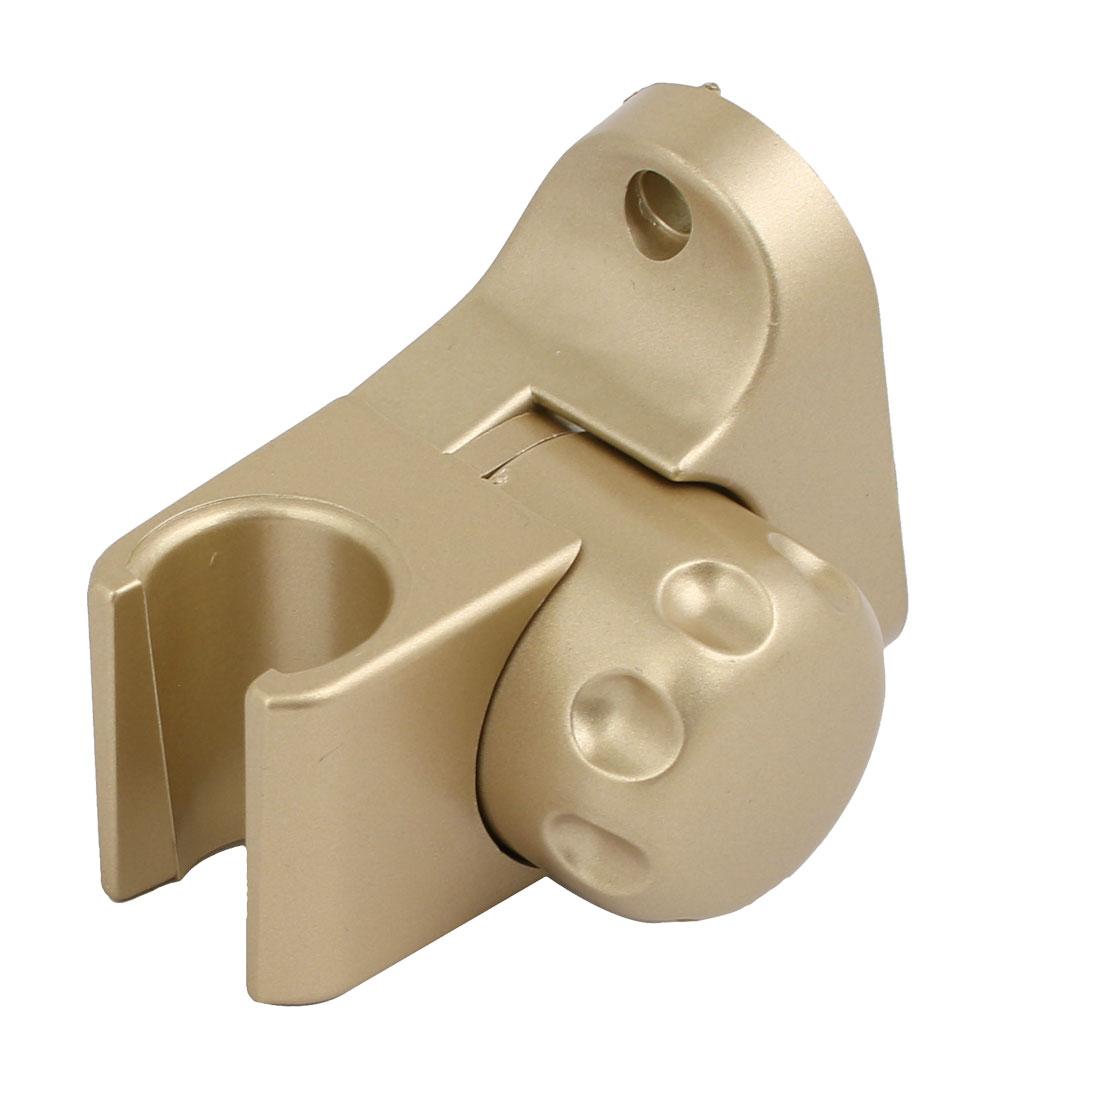 Bathroom Adjustable ABS Chrome Plated Handheld Shower Head Holder Gold Tone